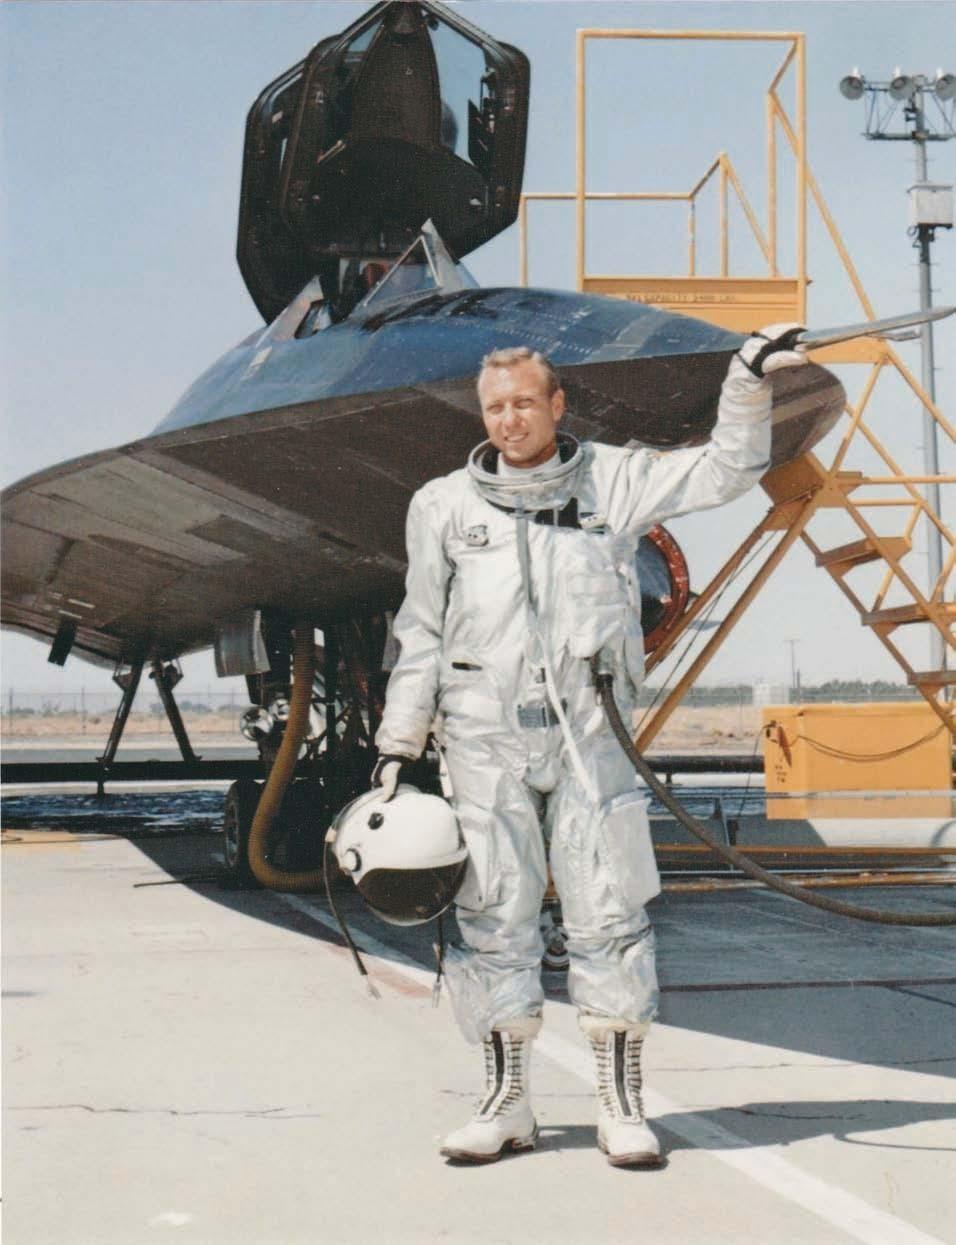 SR-71 pilot Bill Weaver